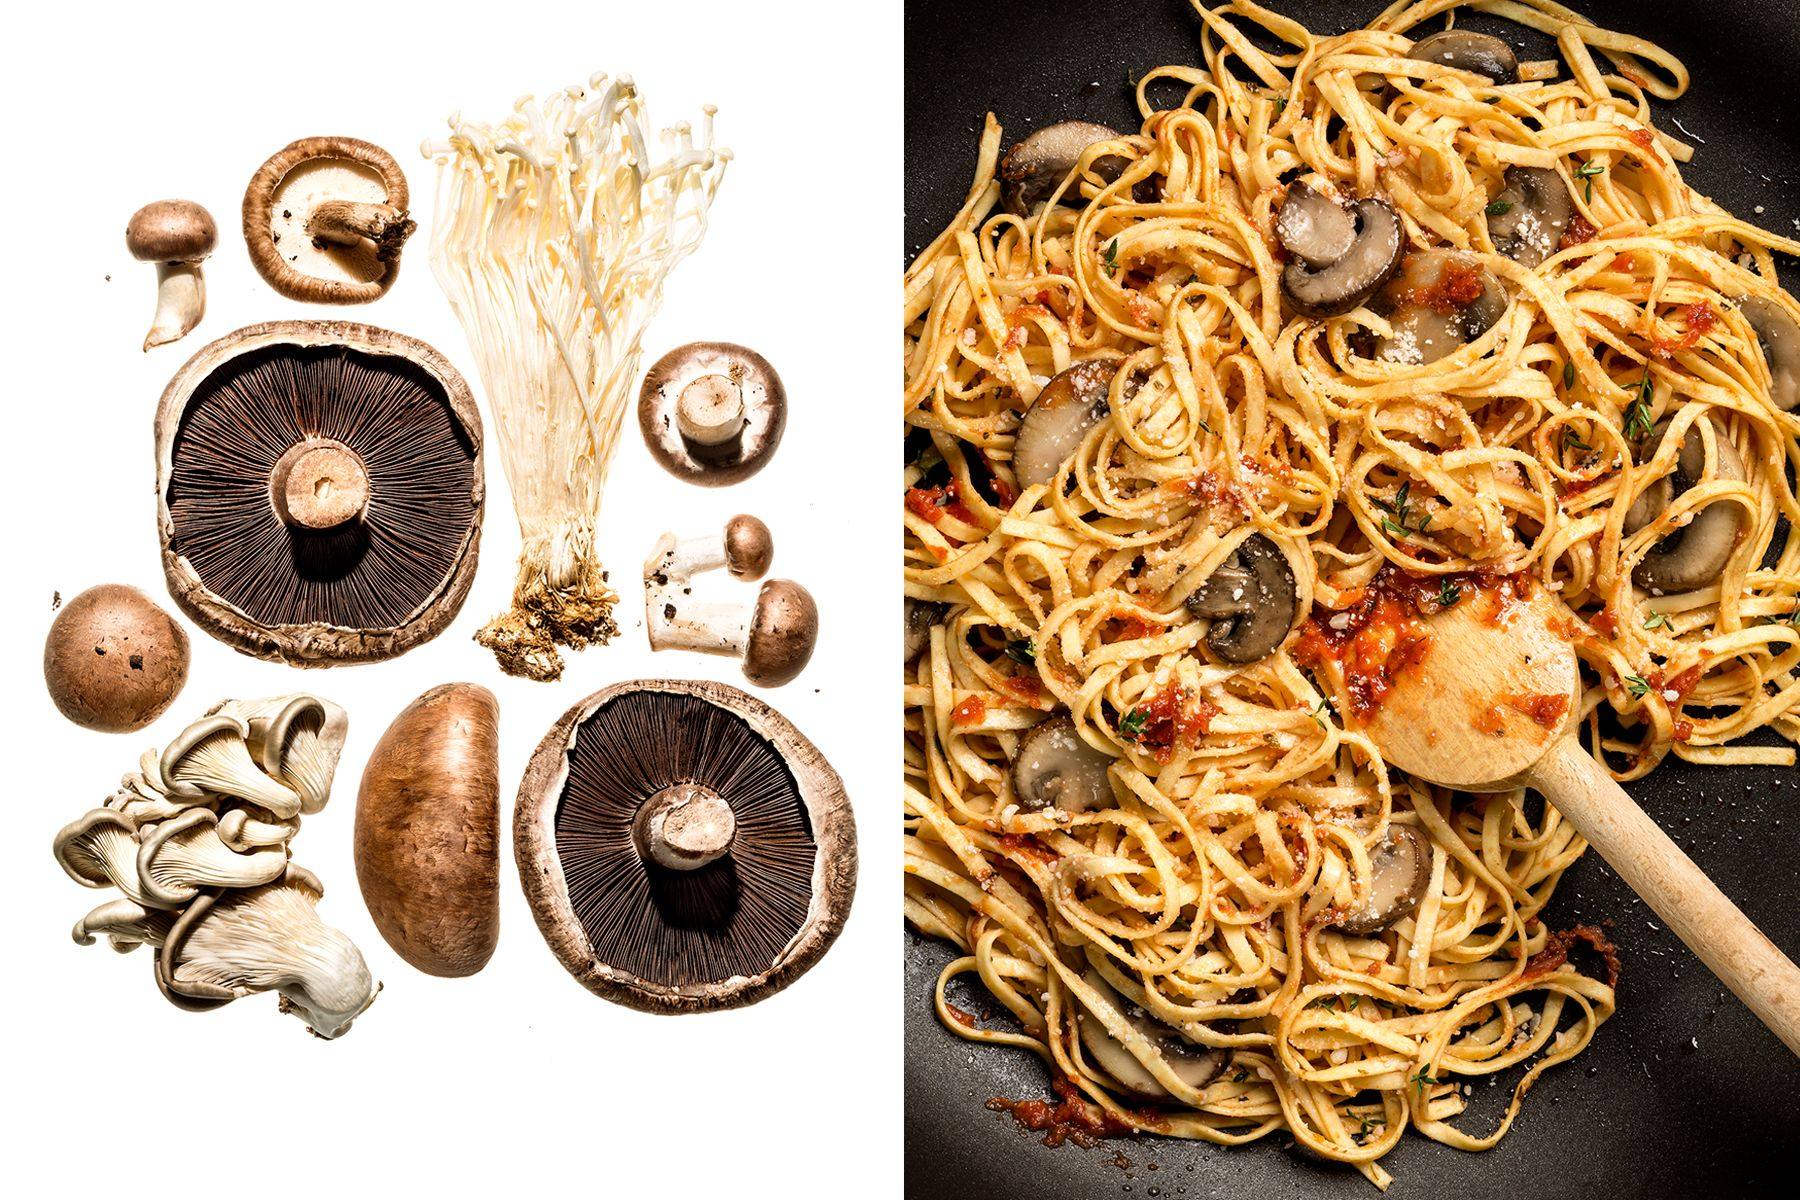 spaghetti_shrooms.jpg